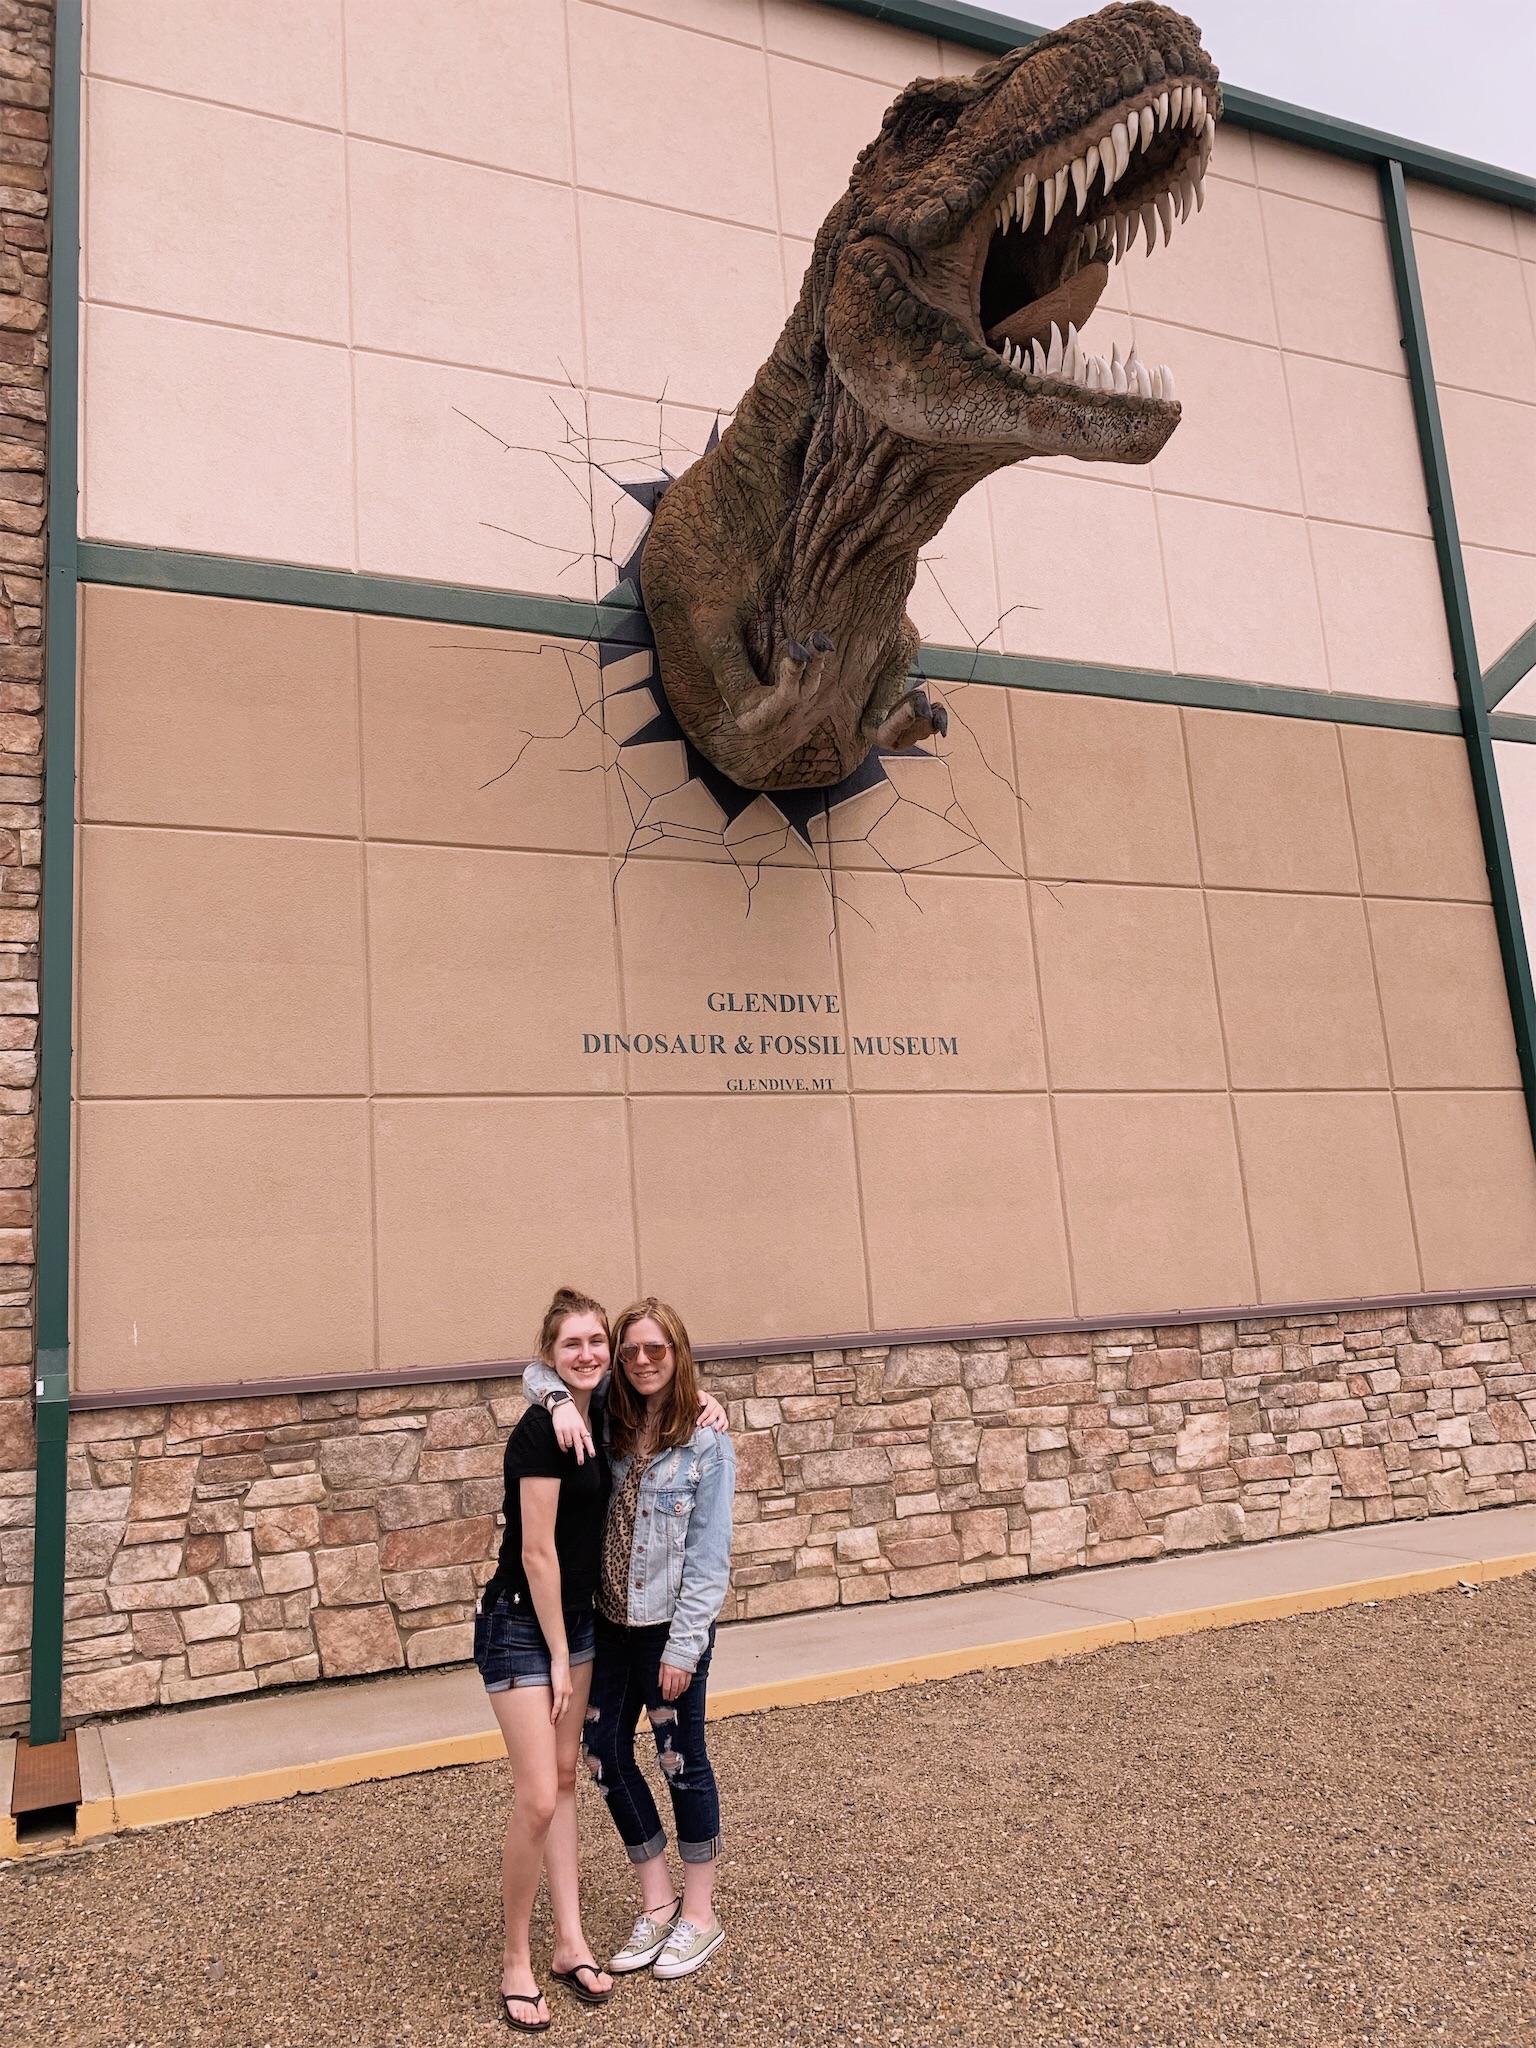 ashlee-kirsten-glendive-dinosaur-museum.jpg